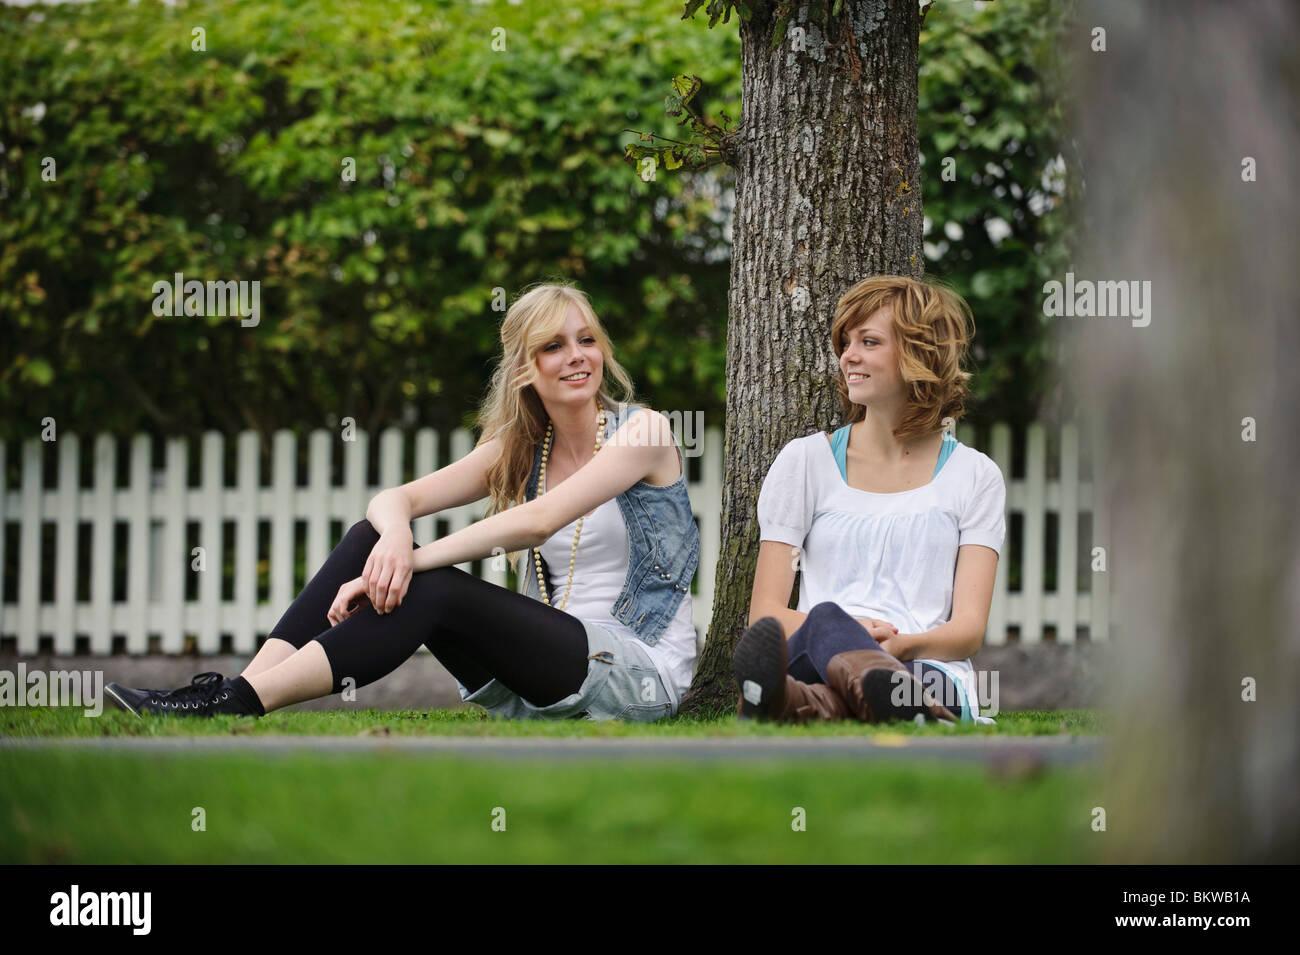 Two girls sitting under tree Stock Photo